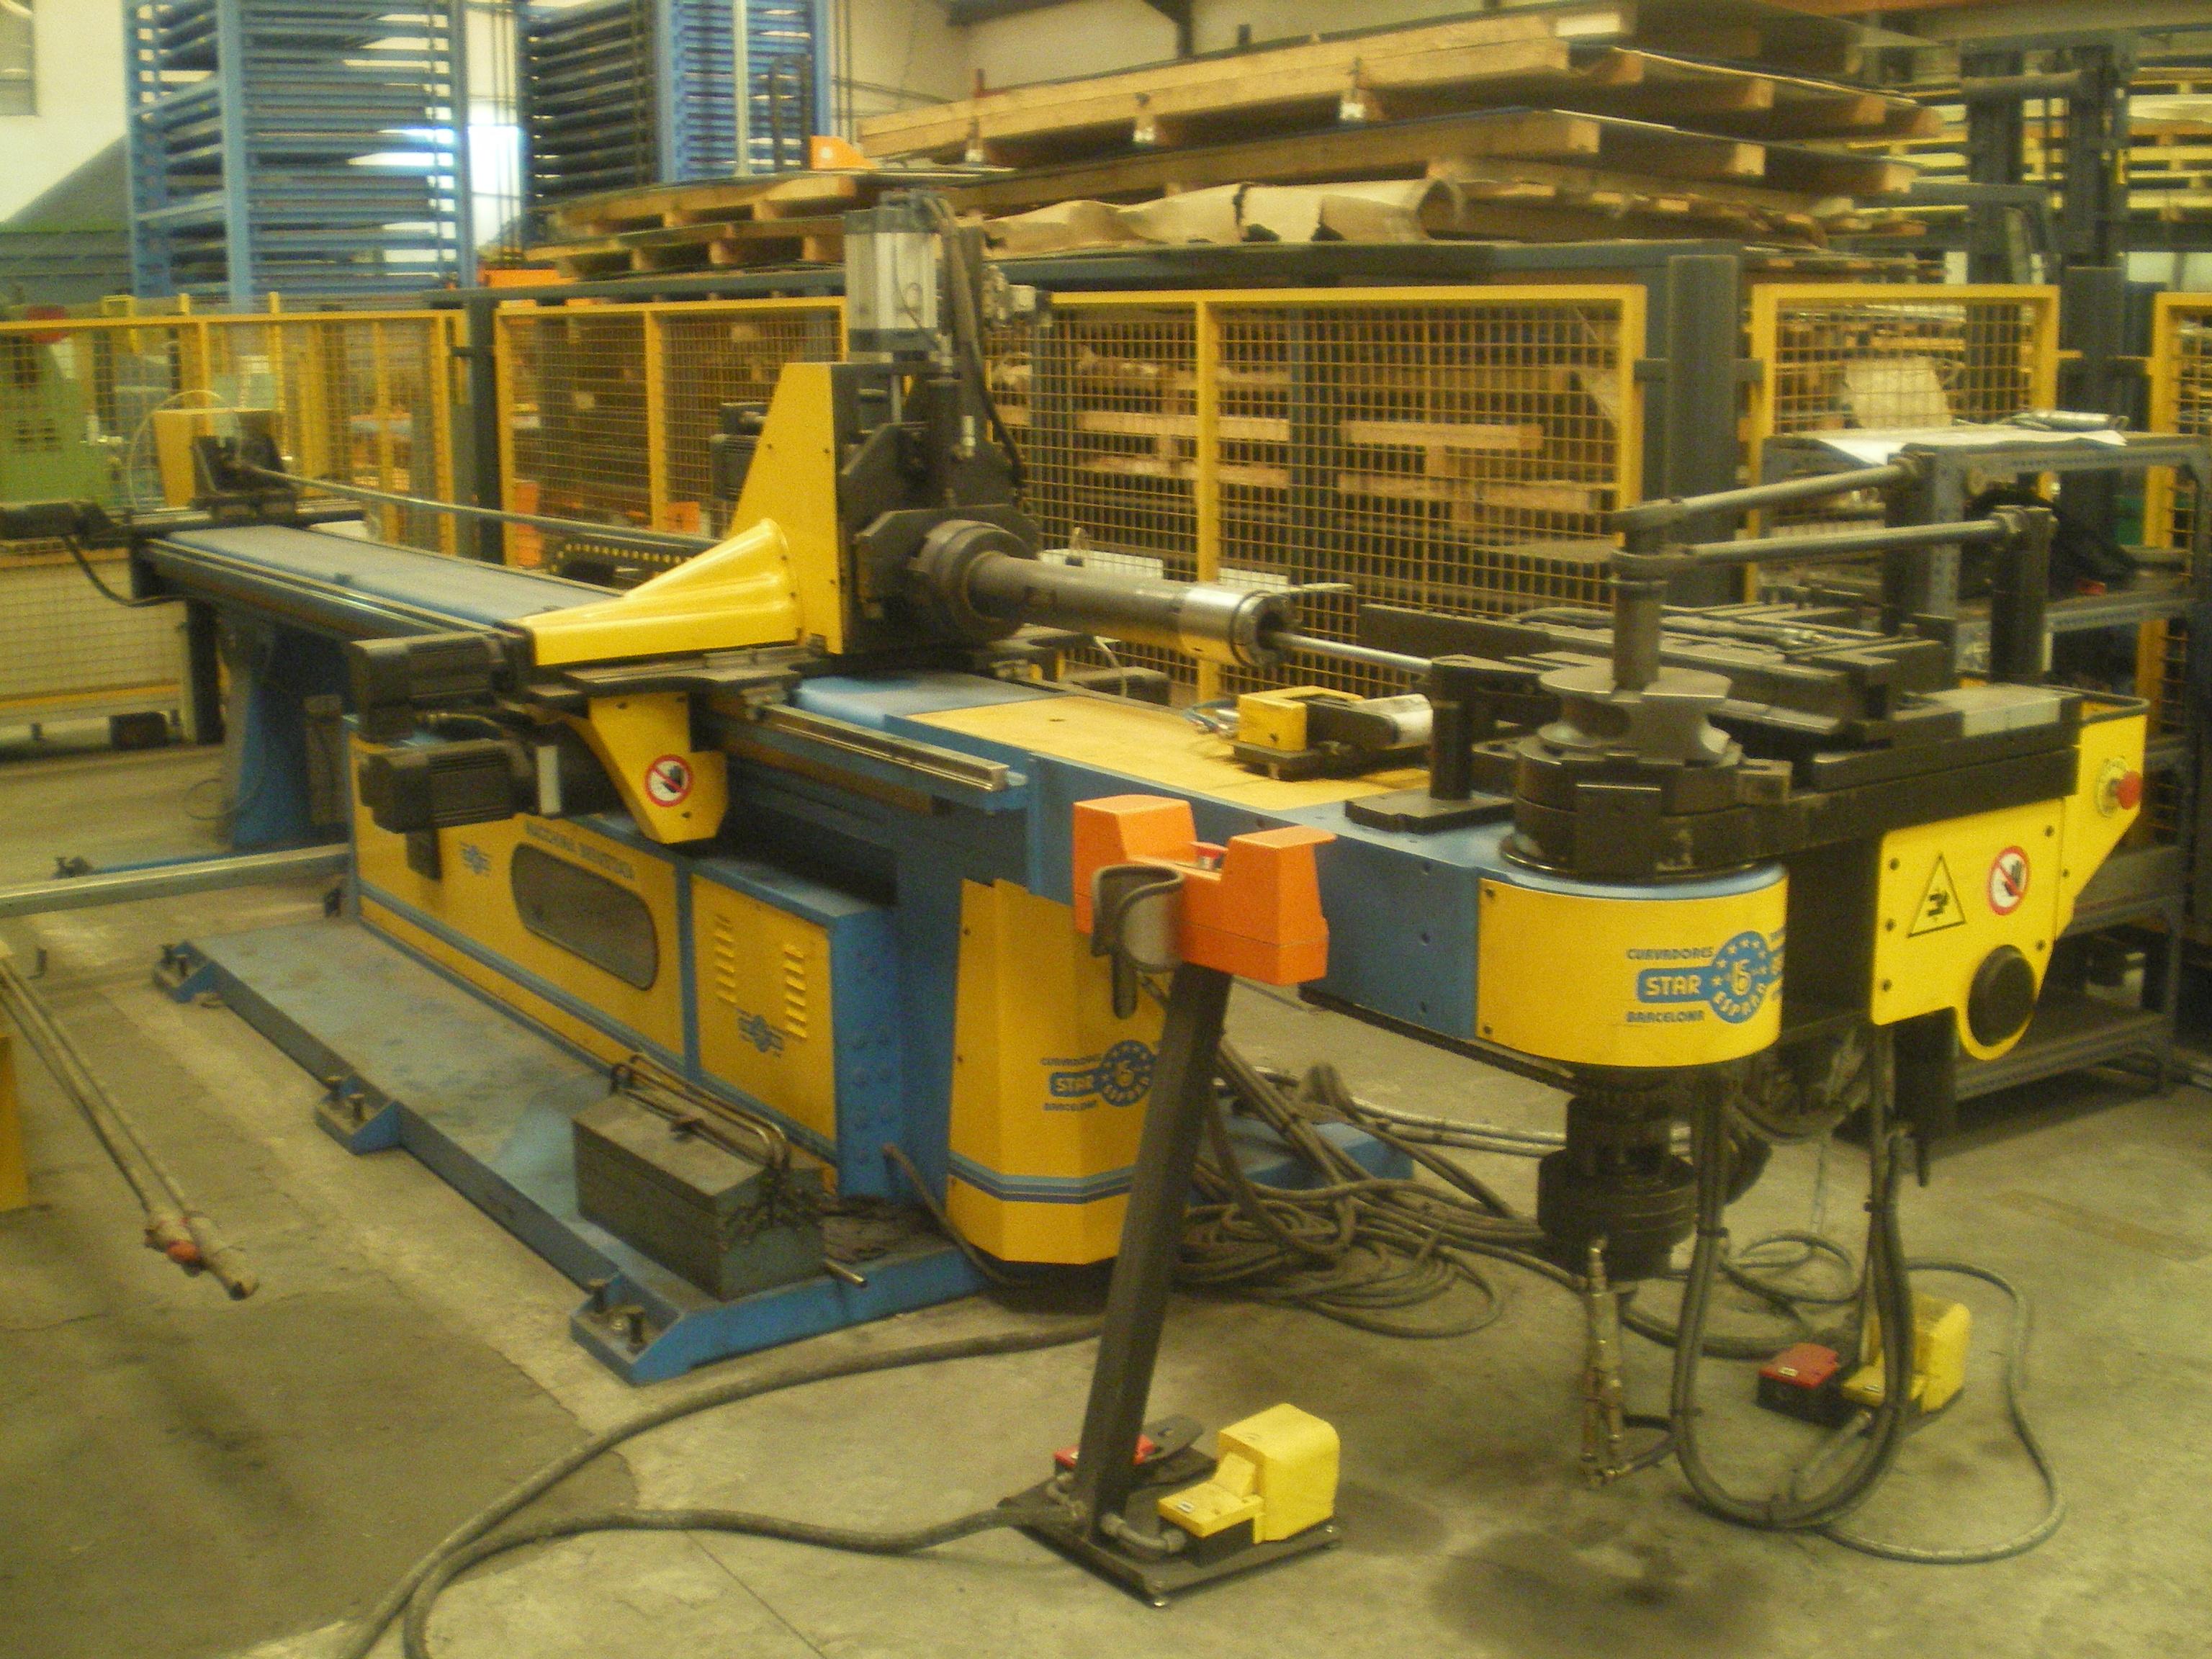 Curvadora de tubos cnc star ben 550 cn6 gen l maquinas de for Curvadora de tubos segunda mano